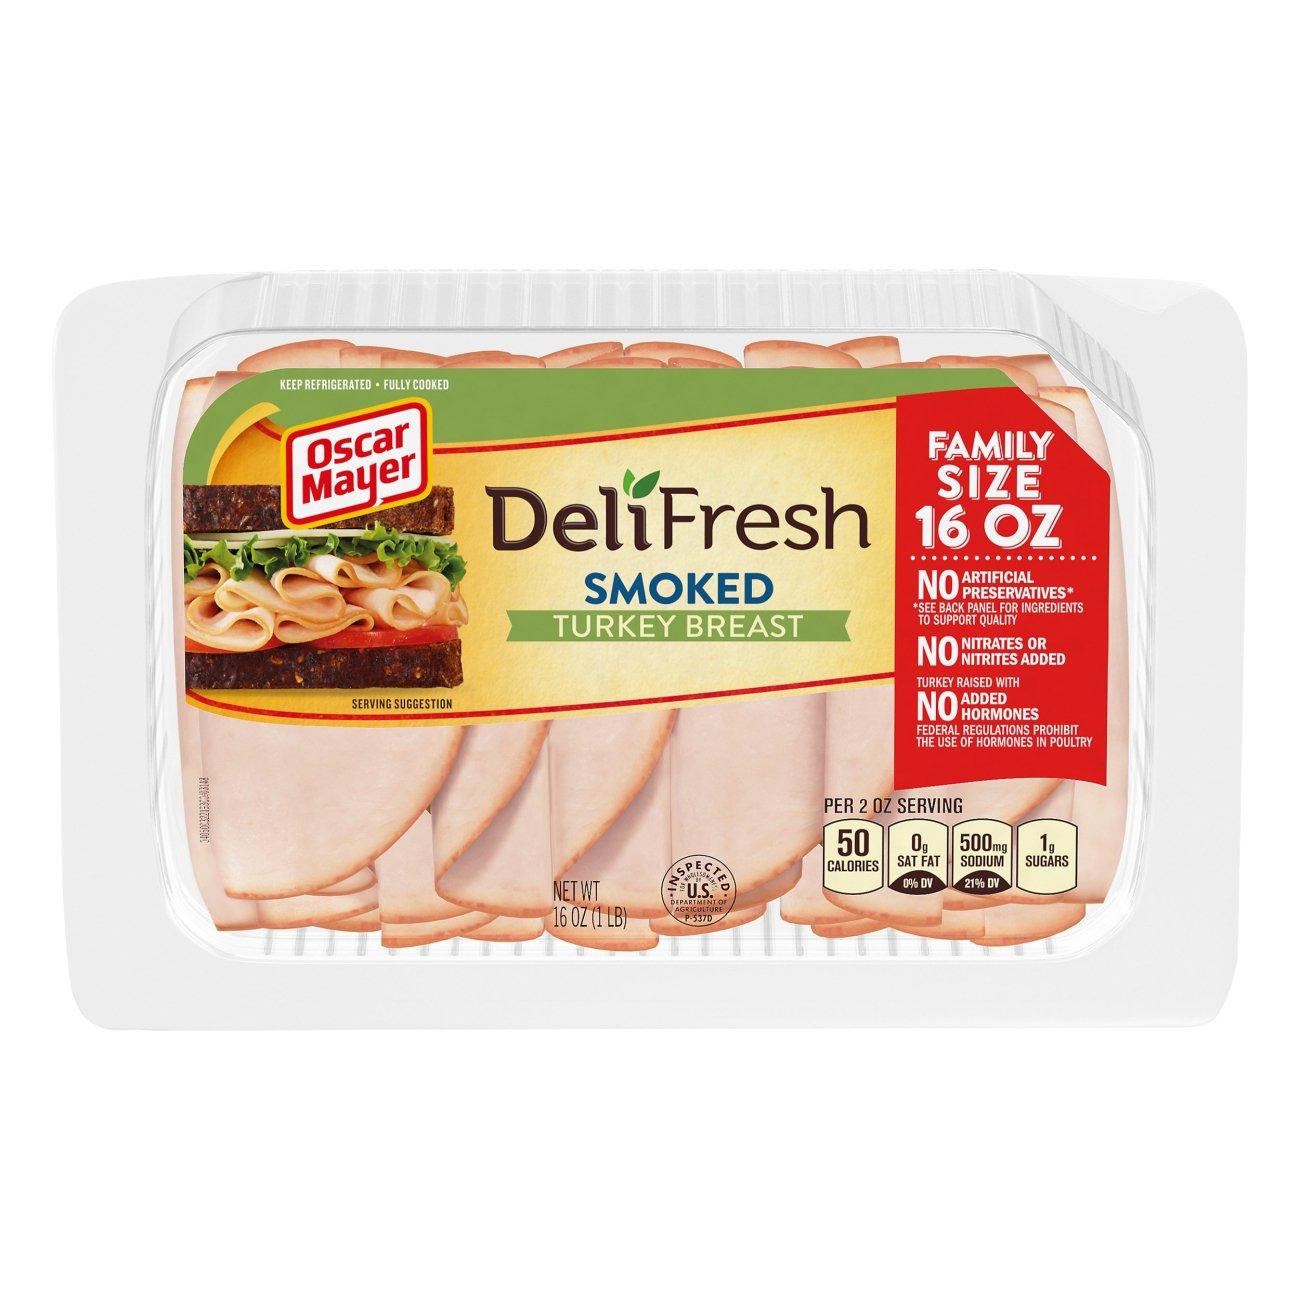 Oscar Mayer Deli Fresh Smoked Turkey Breast Shop Meat At H E B